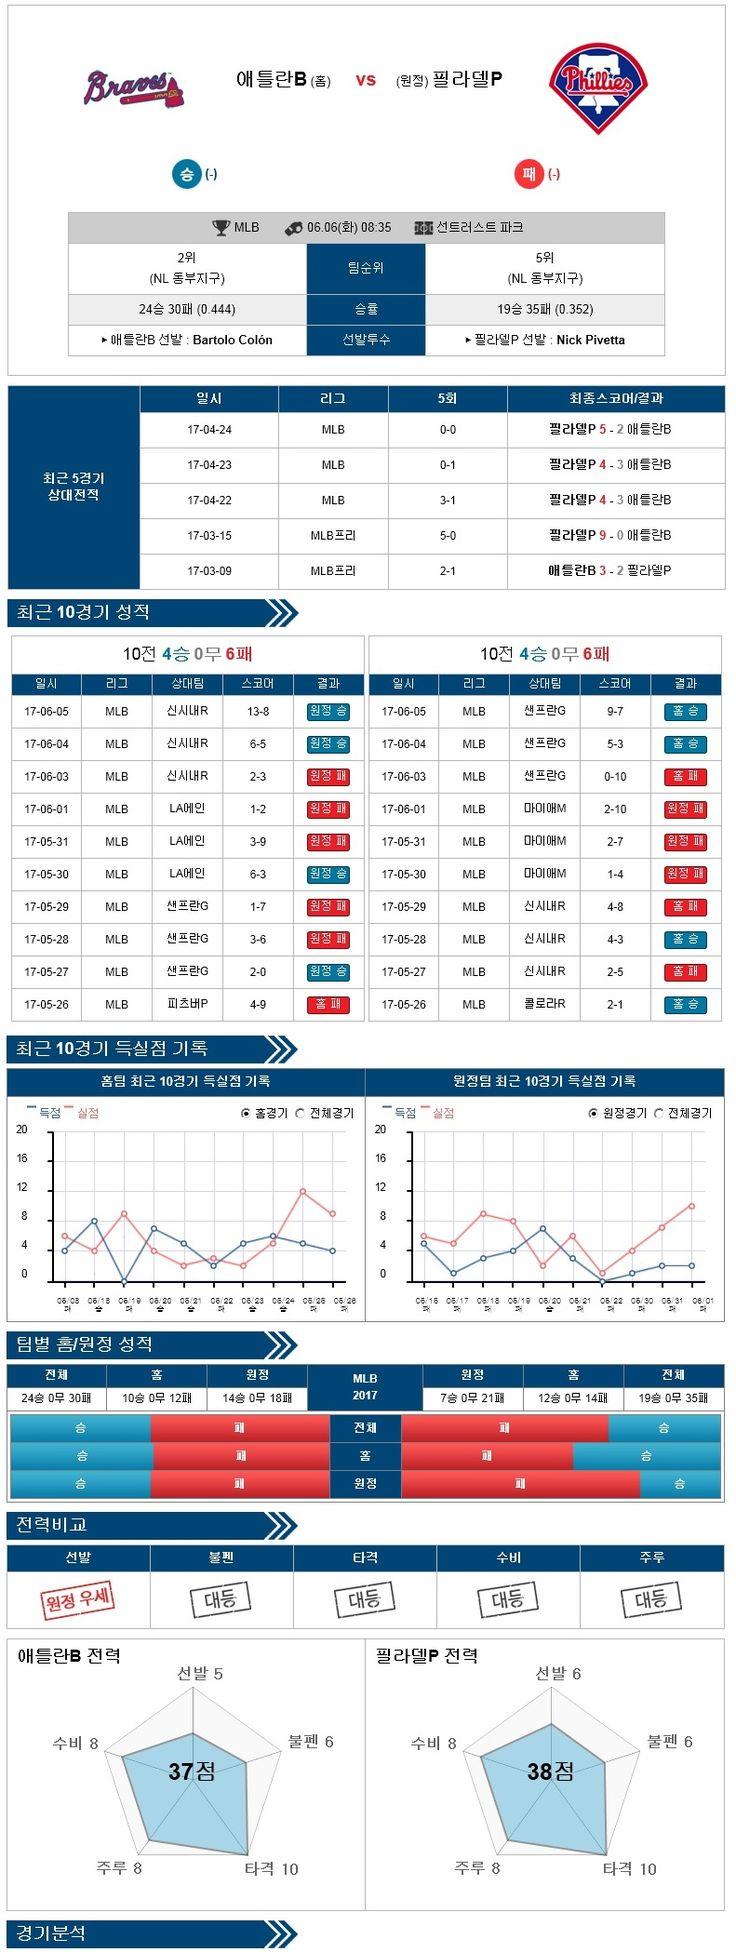 [MLB] 6월 06일 애틀랜타 vs 필라델피아 ★토토군 분석★